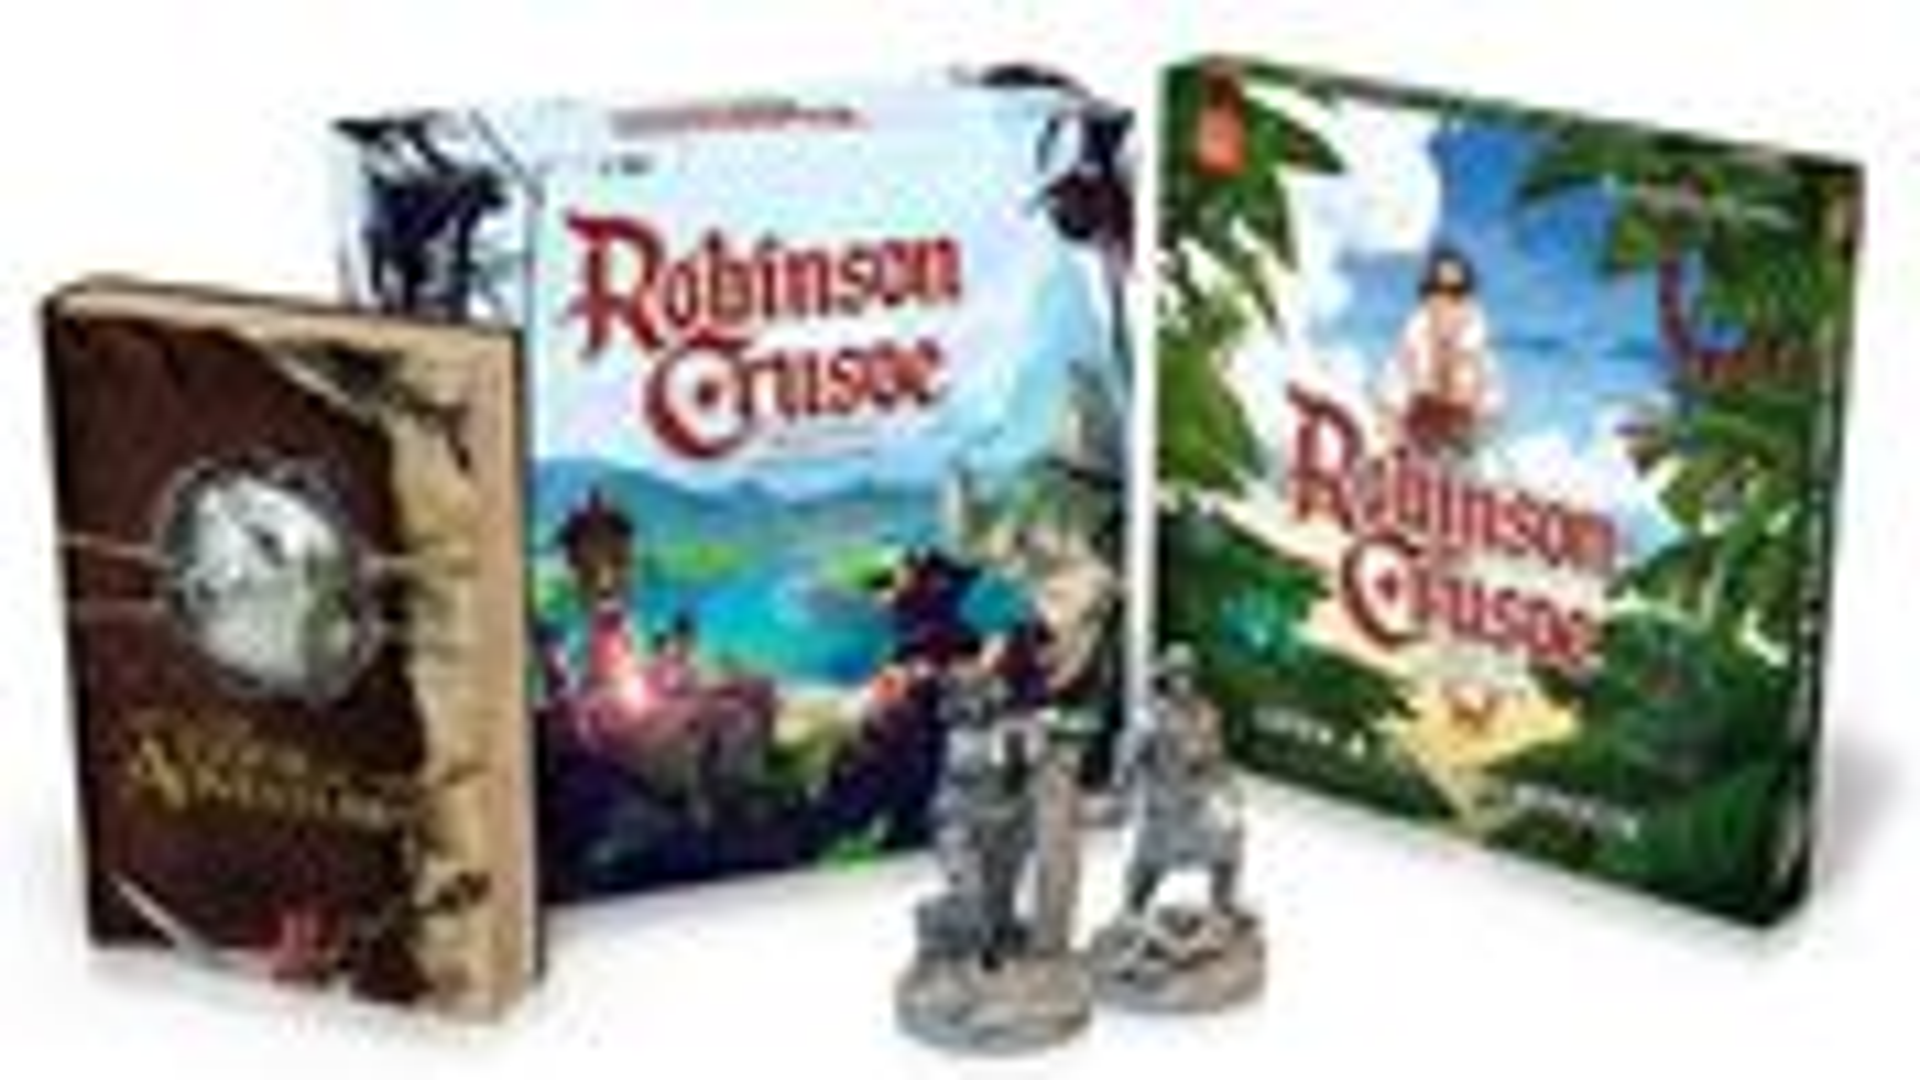 Robinson Crusoe: Collector's Edition box layout